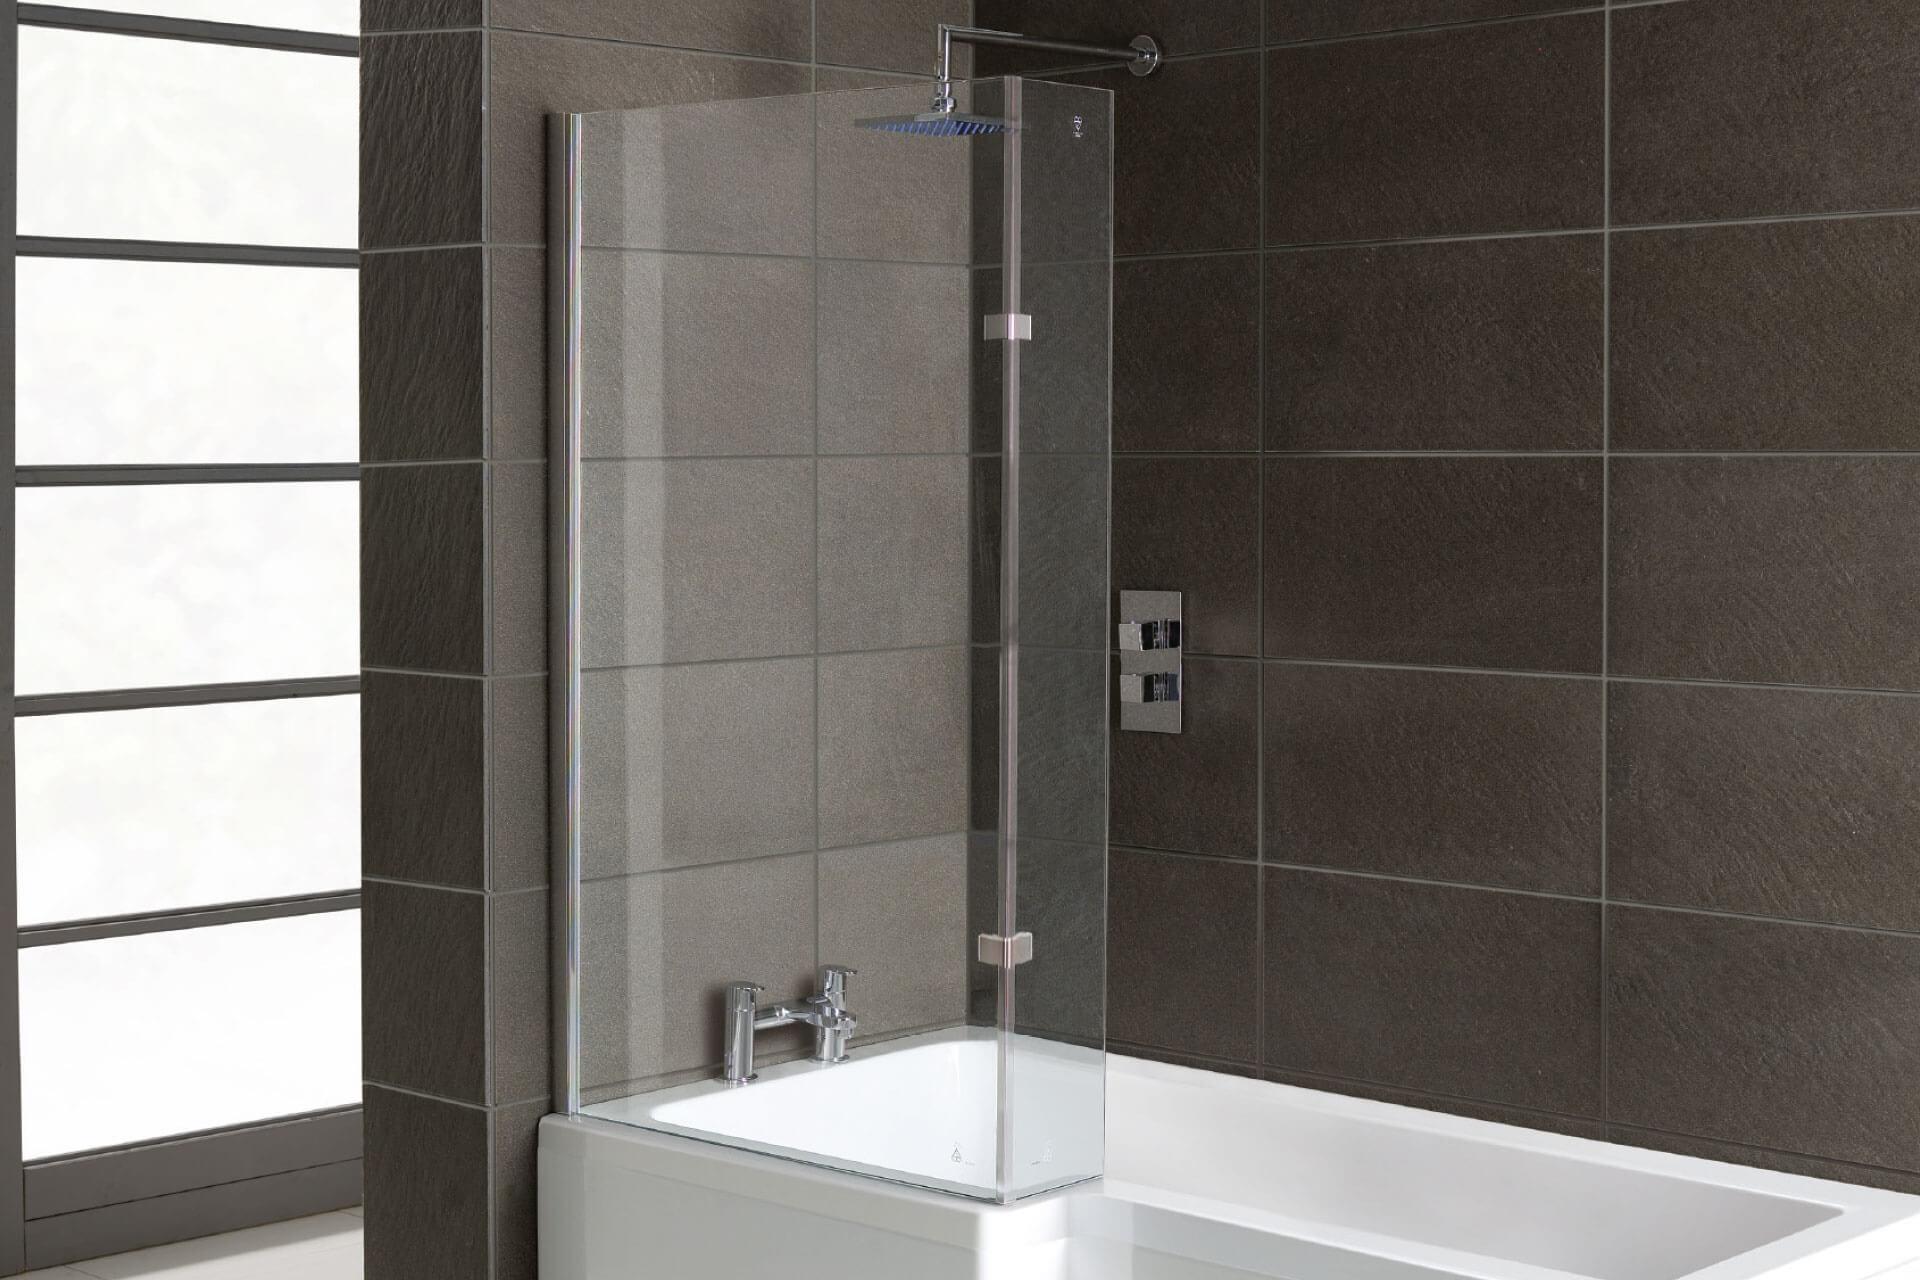 Elle LH Tranquillity Shower Bath UK | Luna Spas